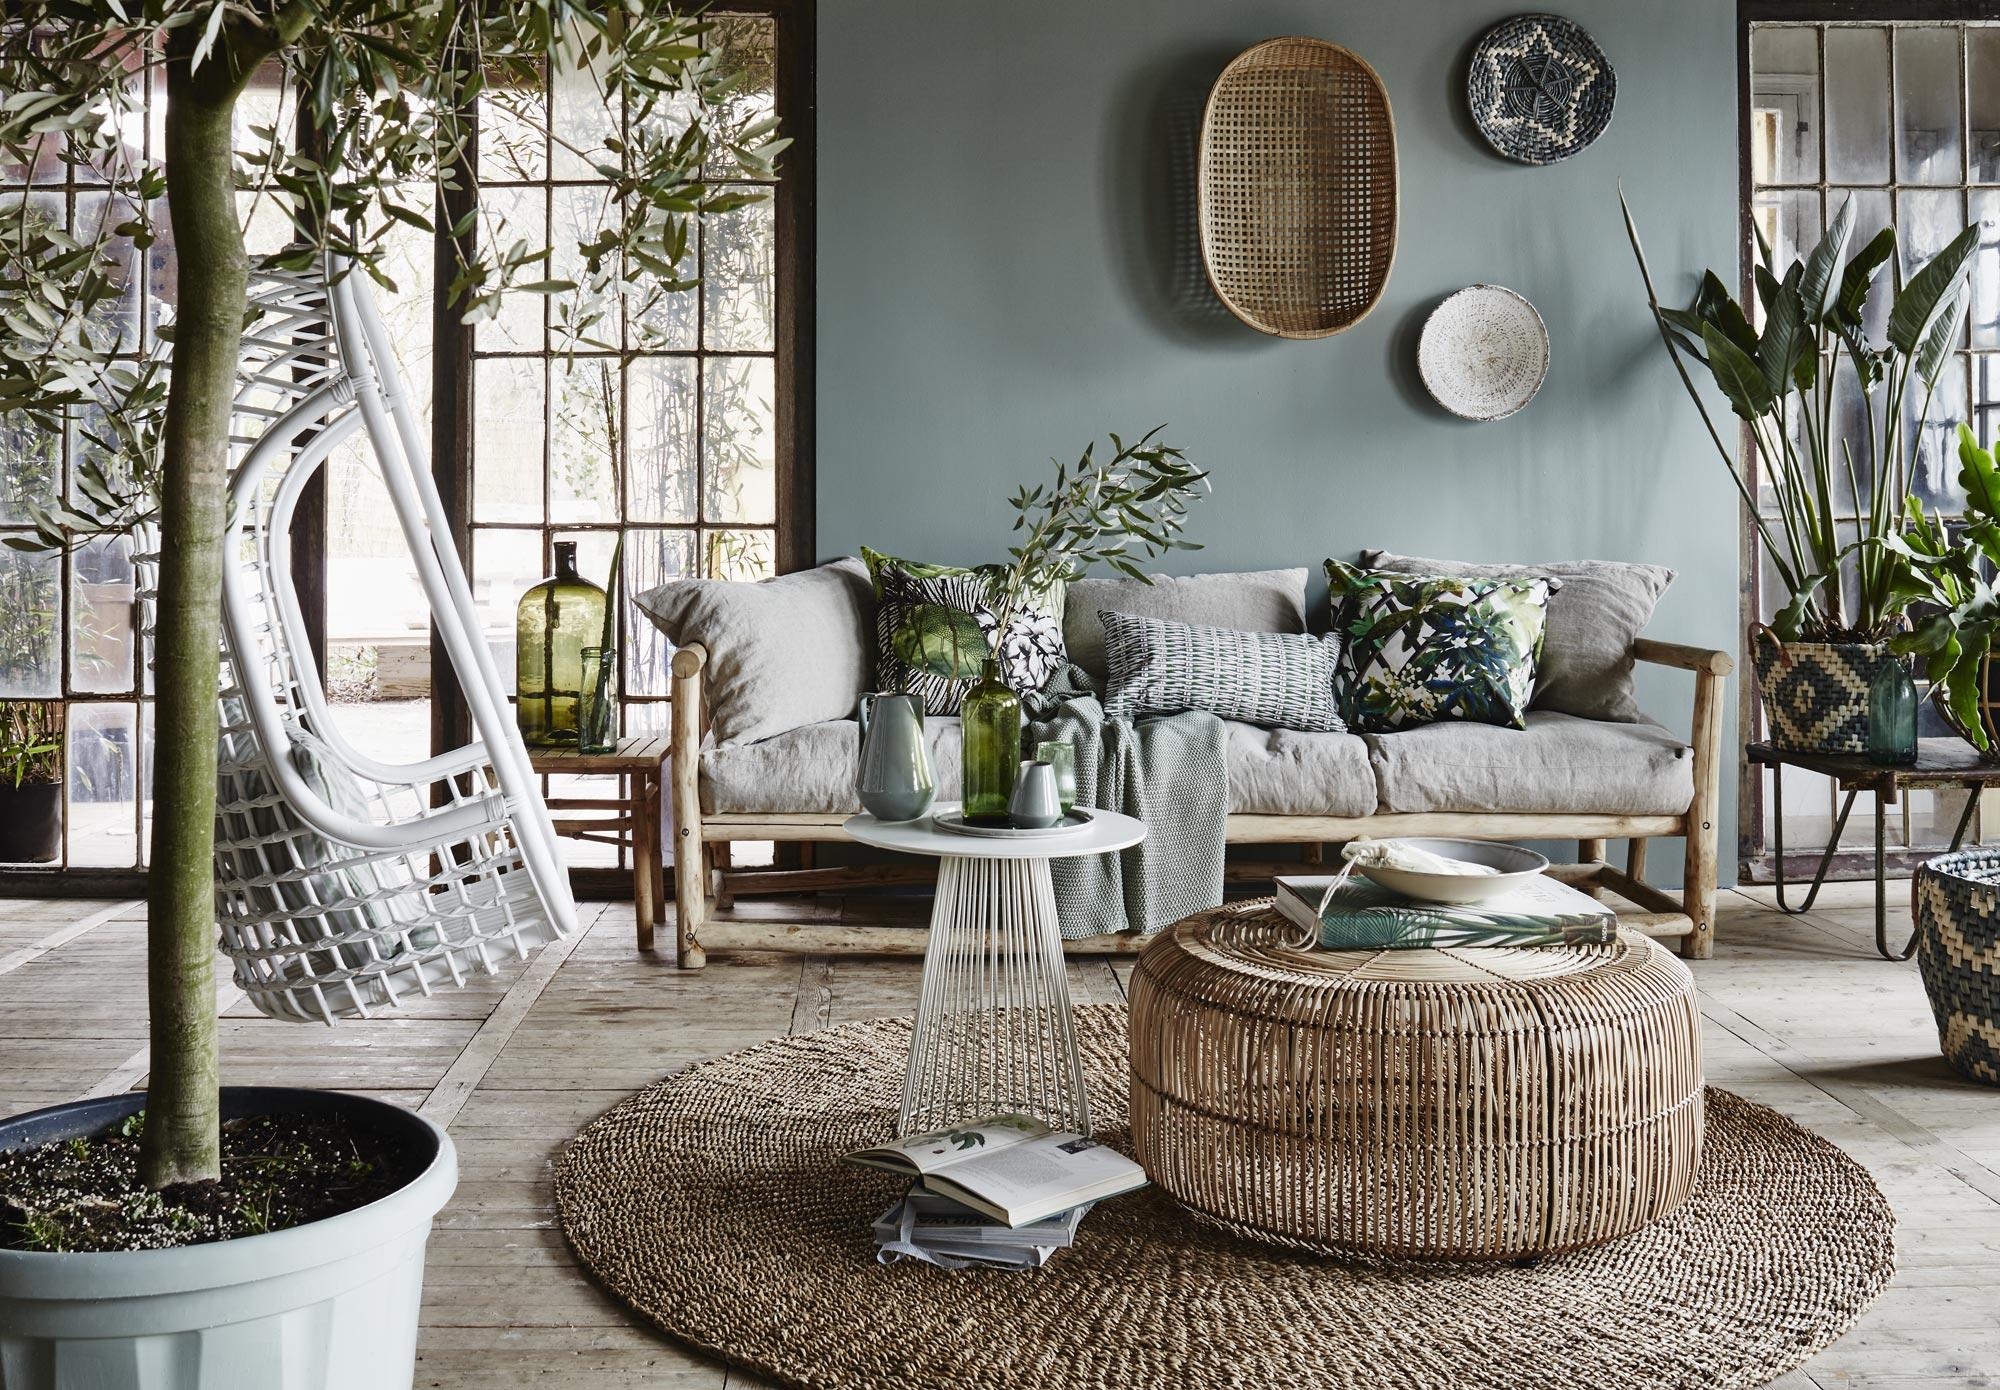 Trendmaterialen: bamboe en rotan in huis